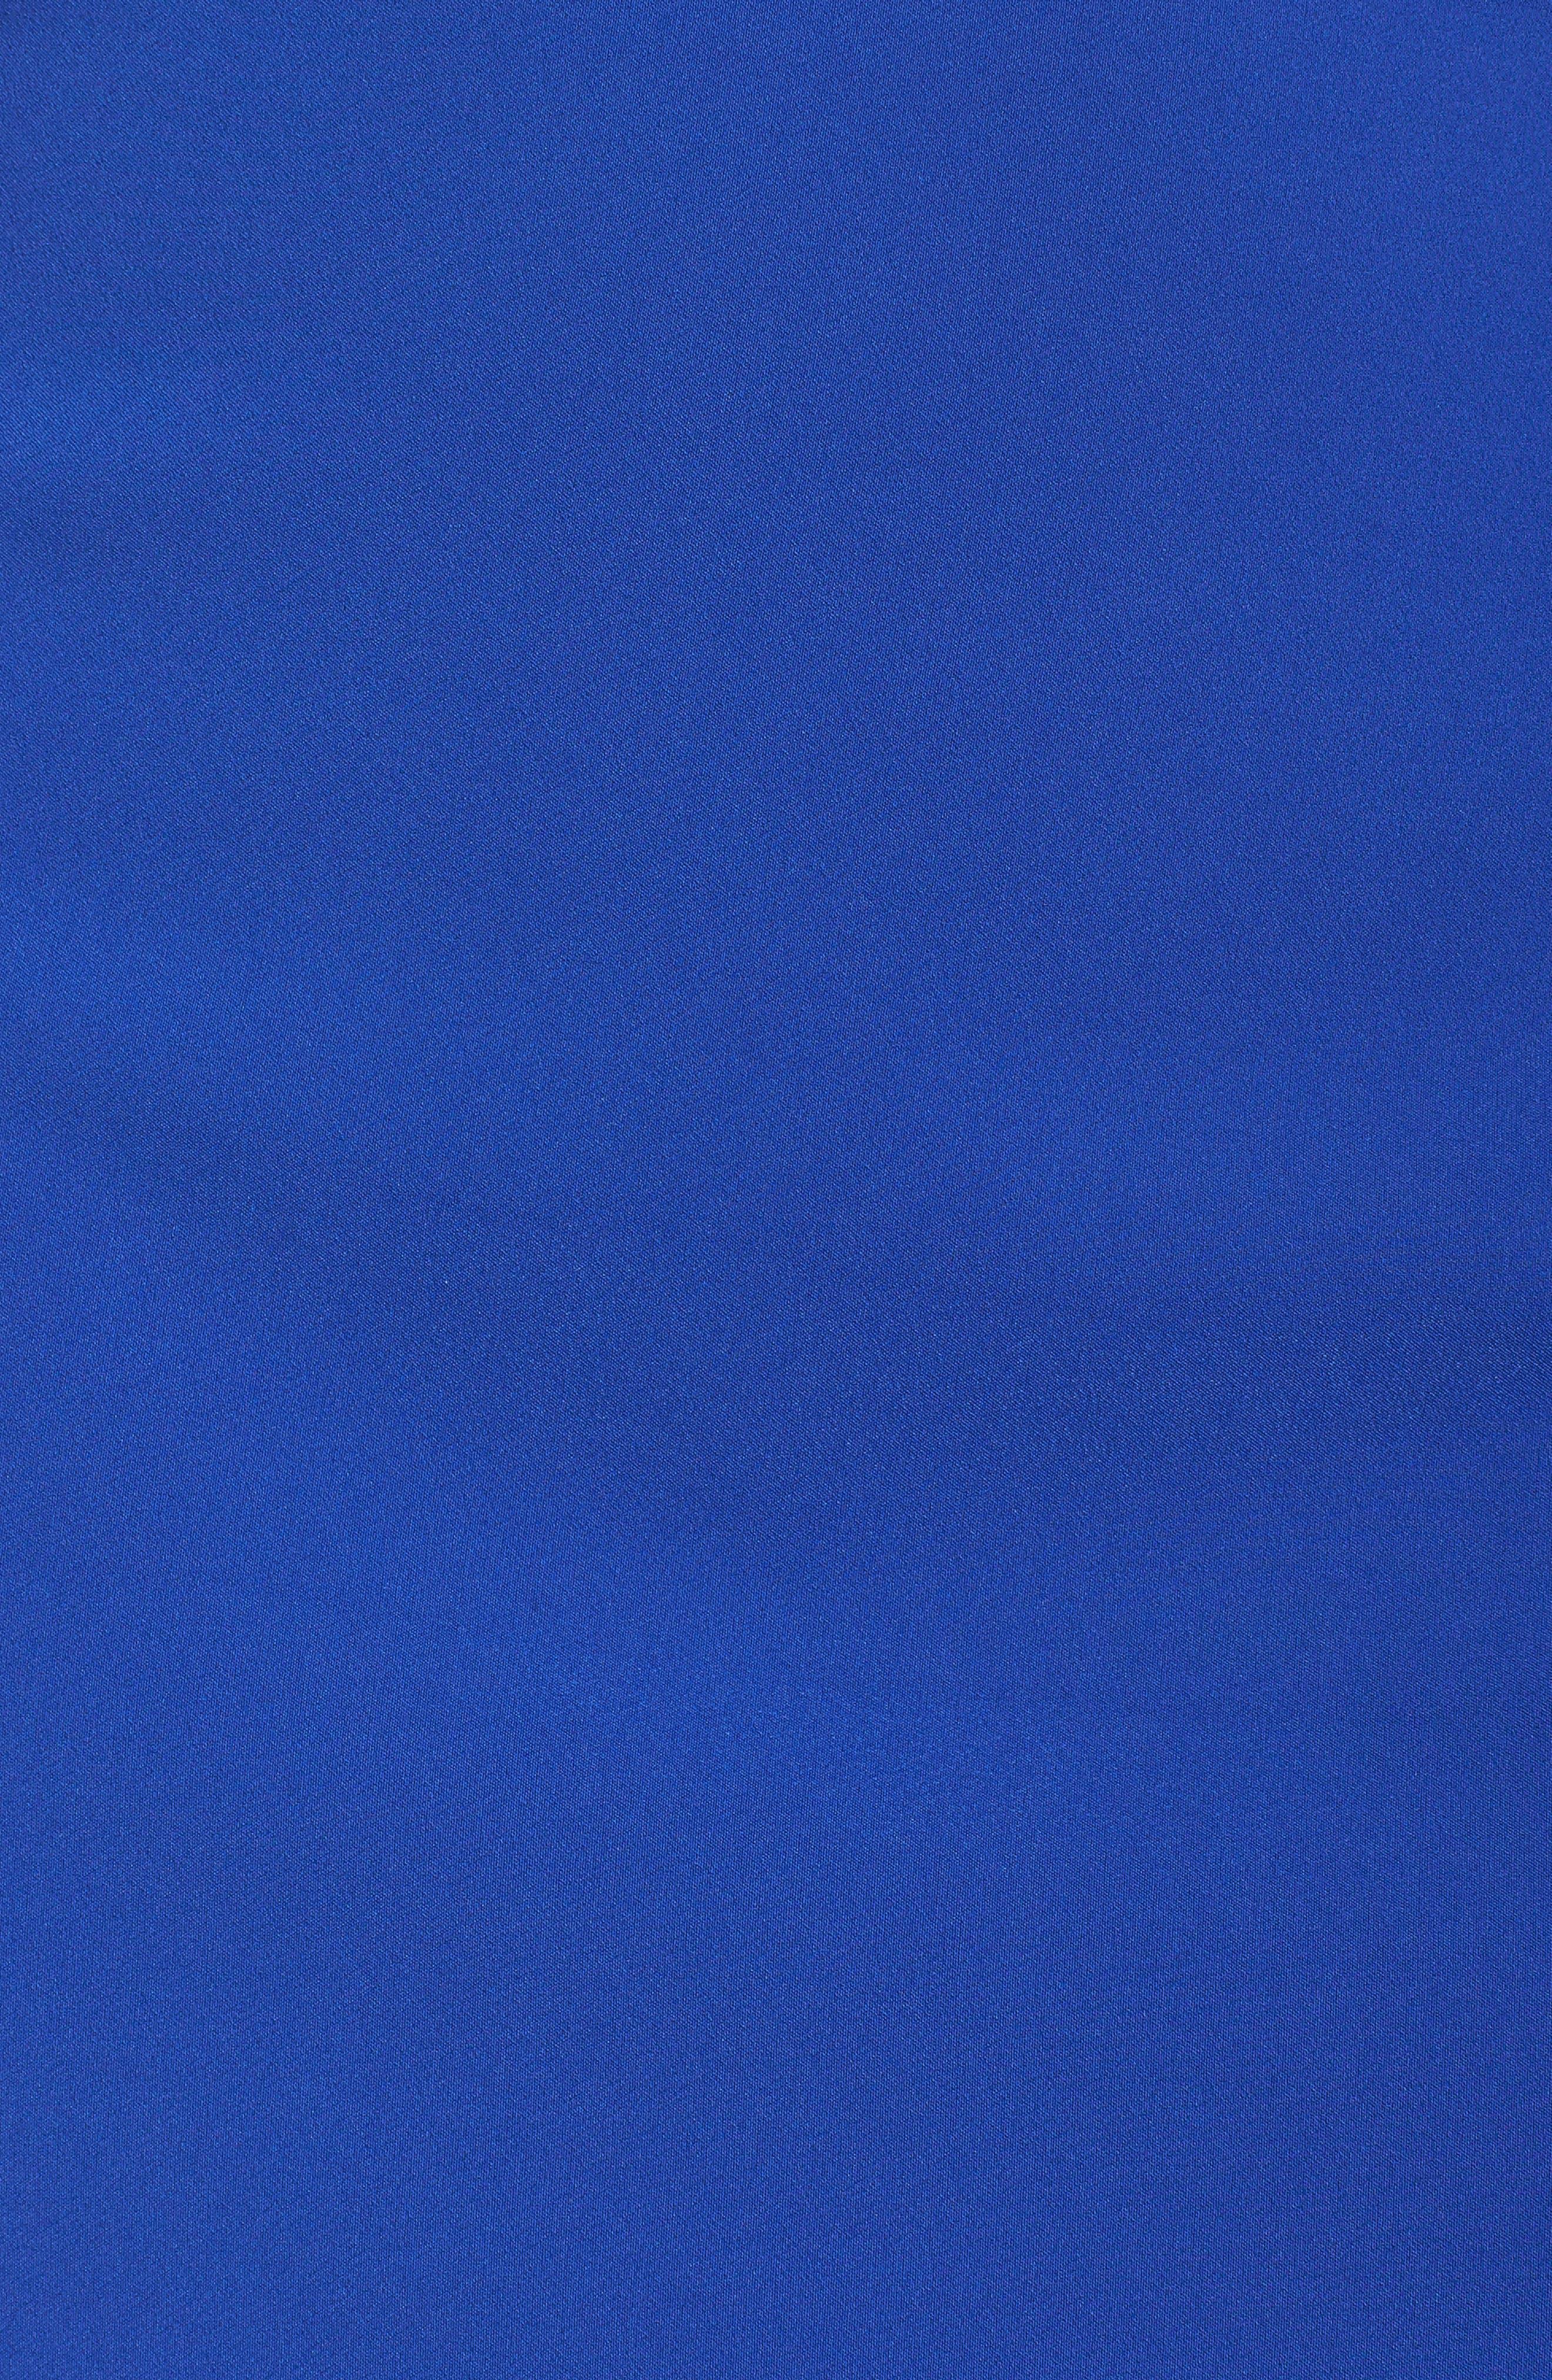 Taylor Racer Cutout Asymmetrical Dress,                             Alternate thumbnail 5, color,